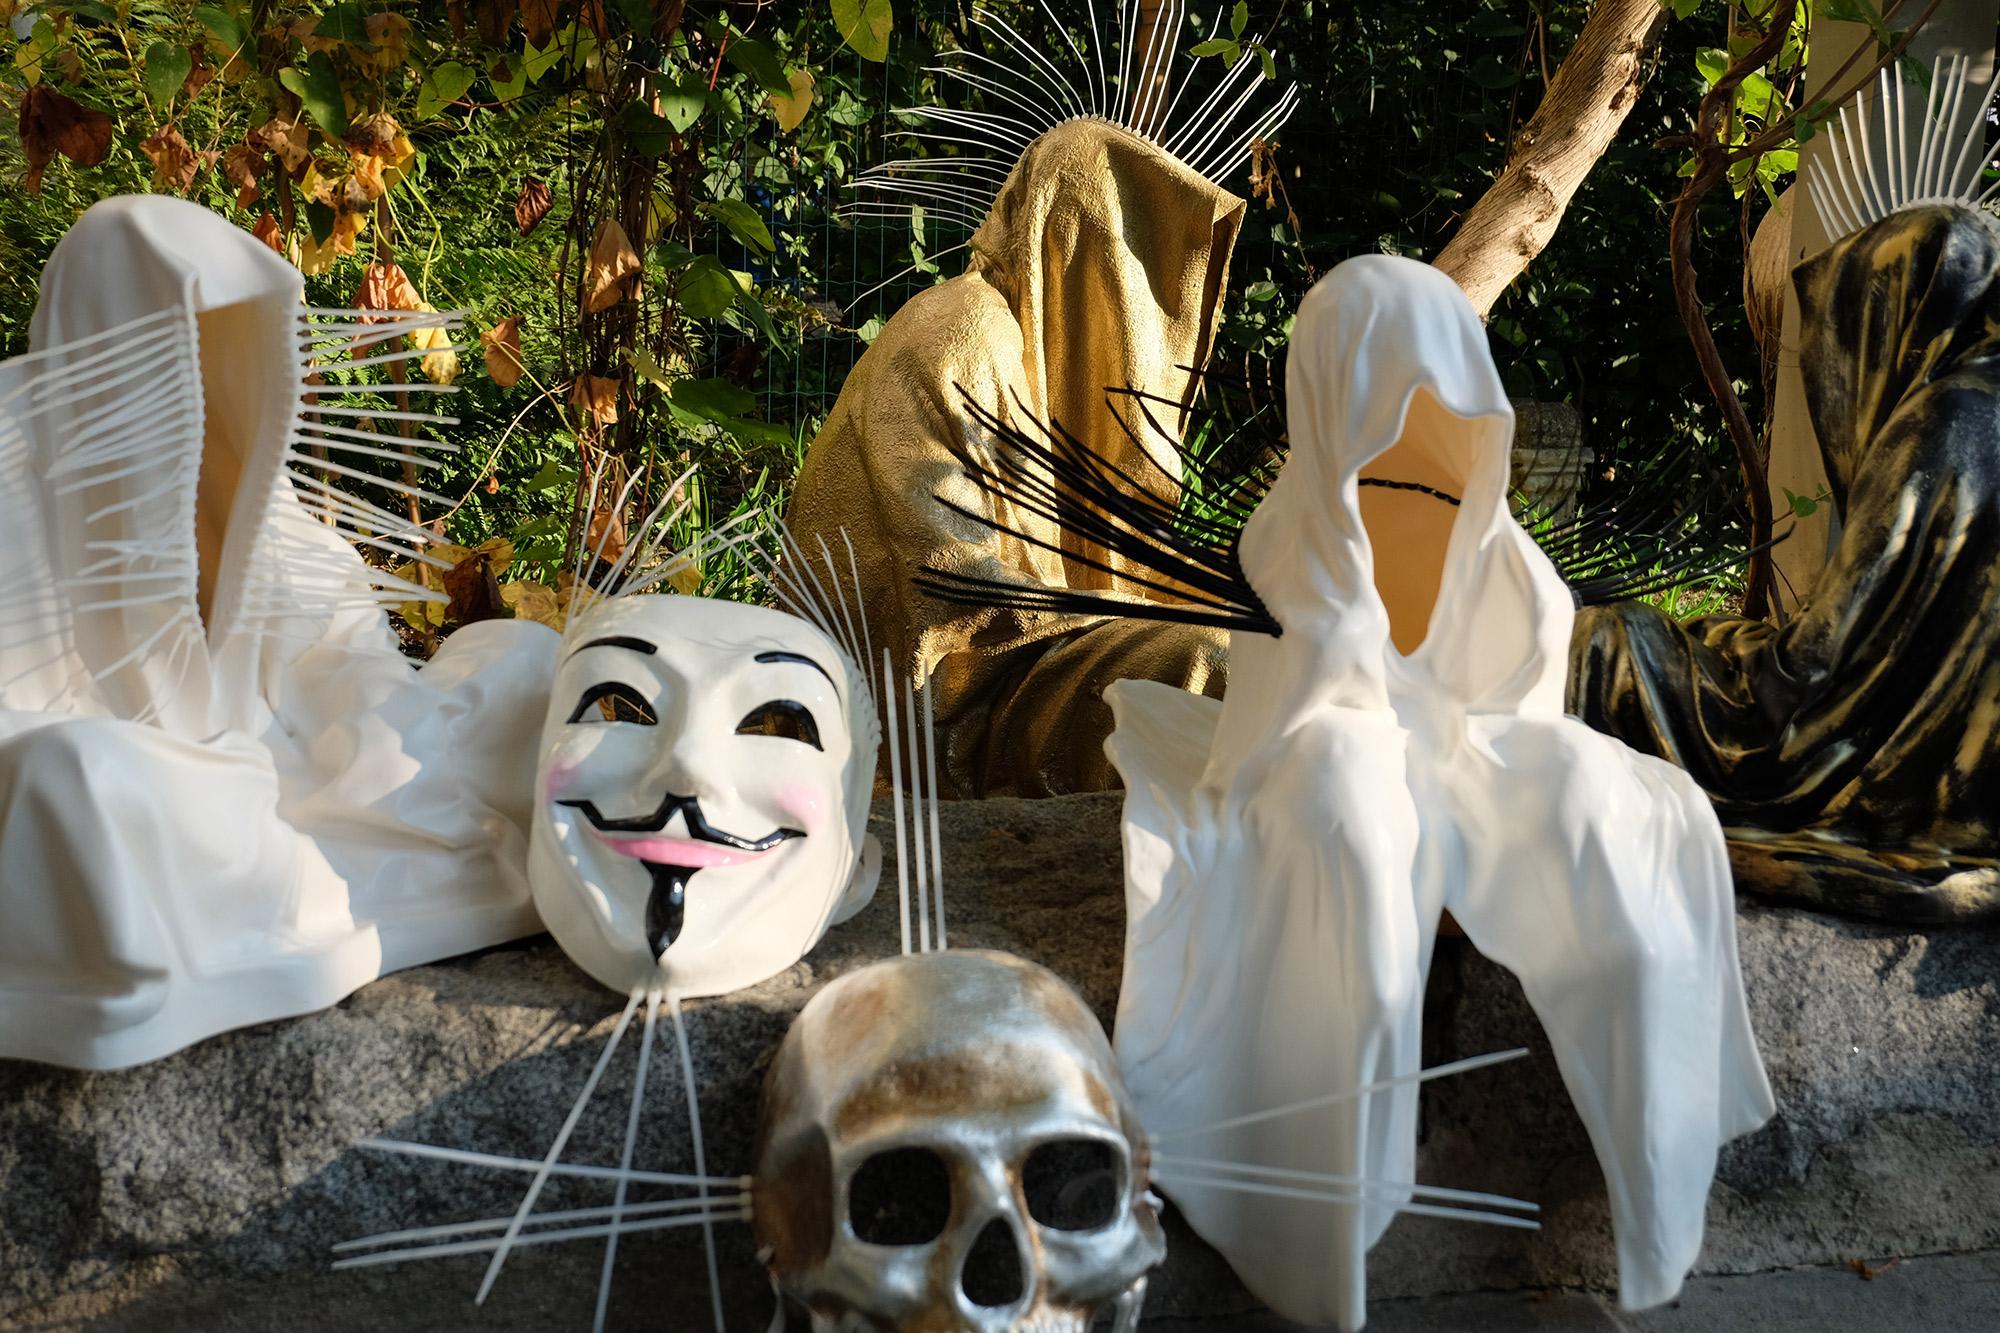 #faceless-#mask-#cableties-#ziptie-ty-#guardiansoftime-#manfredkielnhofer-#contemporaryart-#arts-#design-#sculpture-#statue-#museum-#gallery-#fineart-#lightart-#ghost-#anonymous-8110